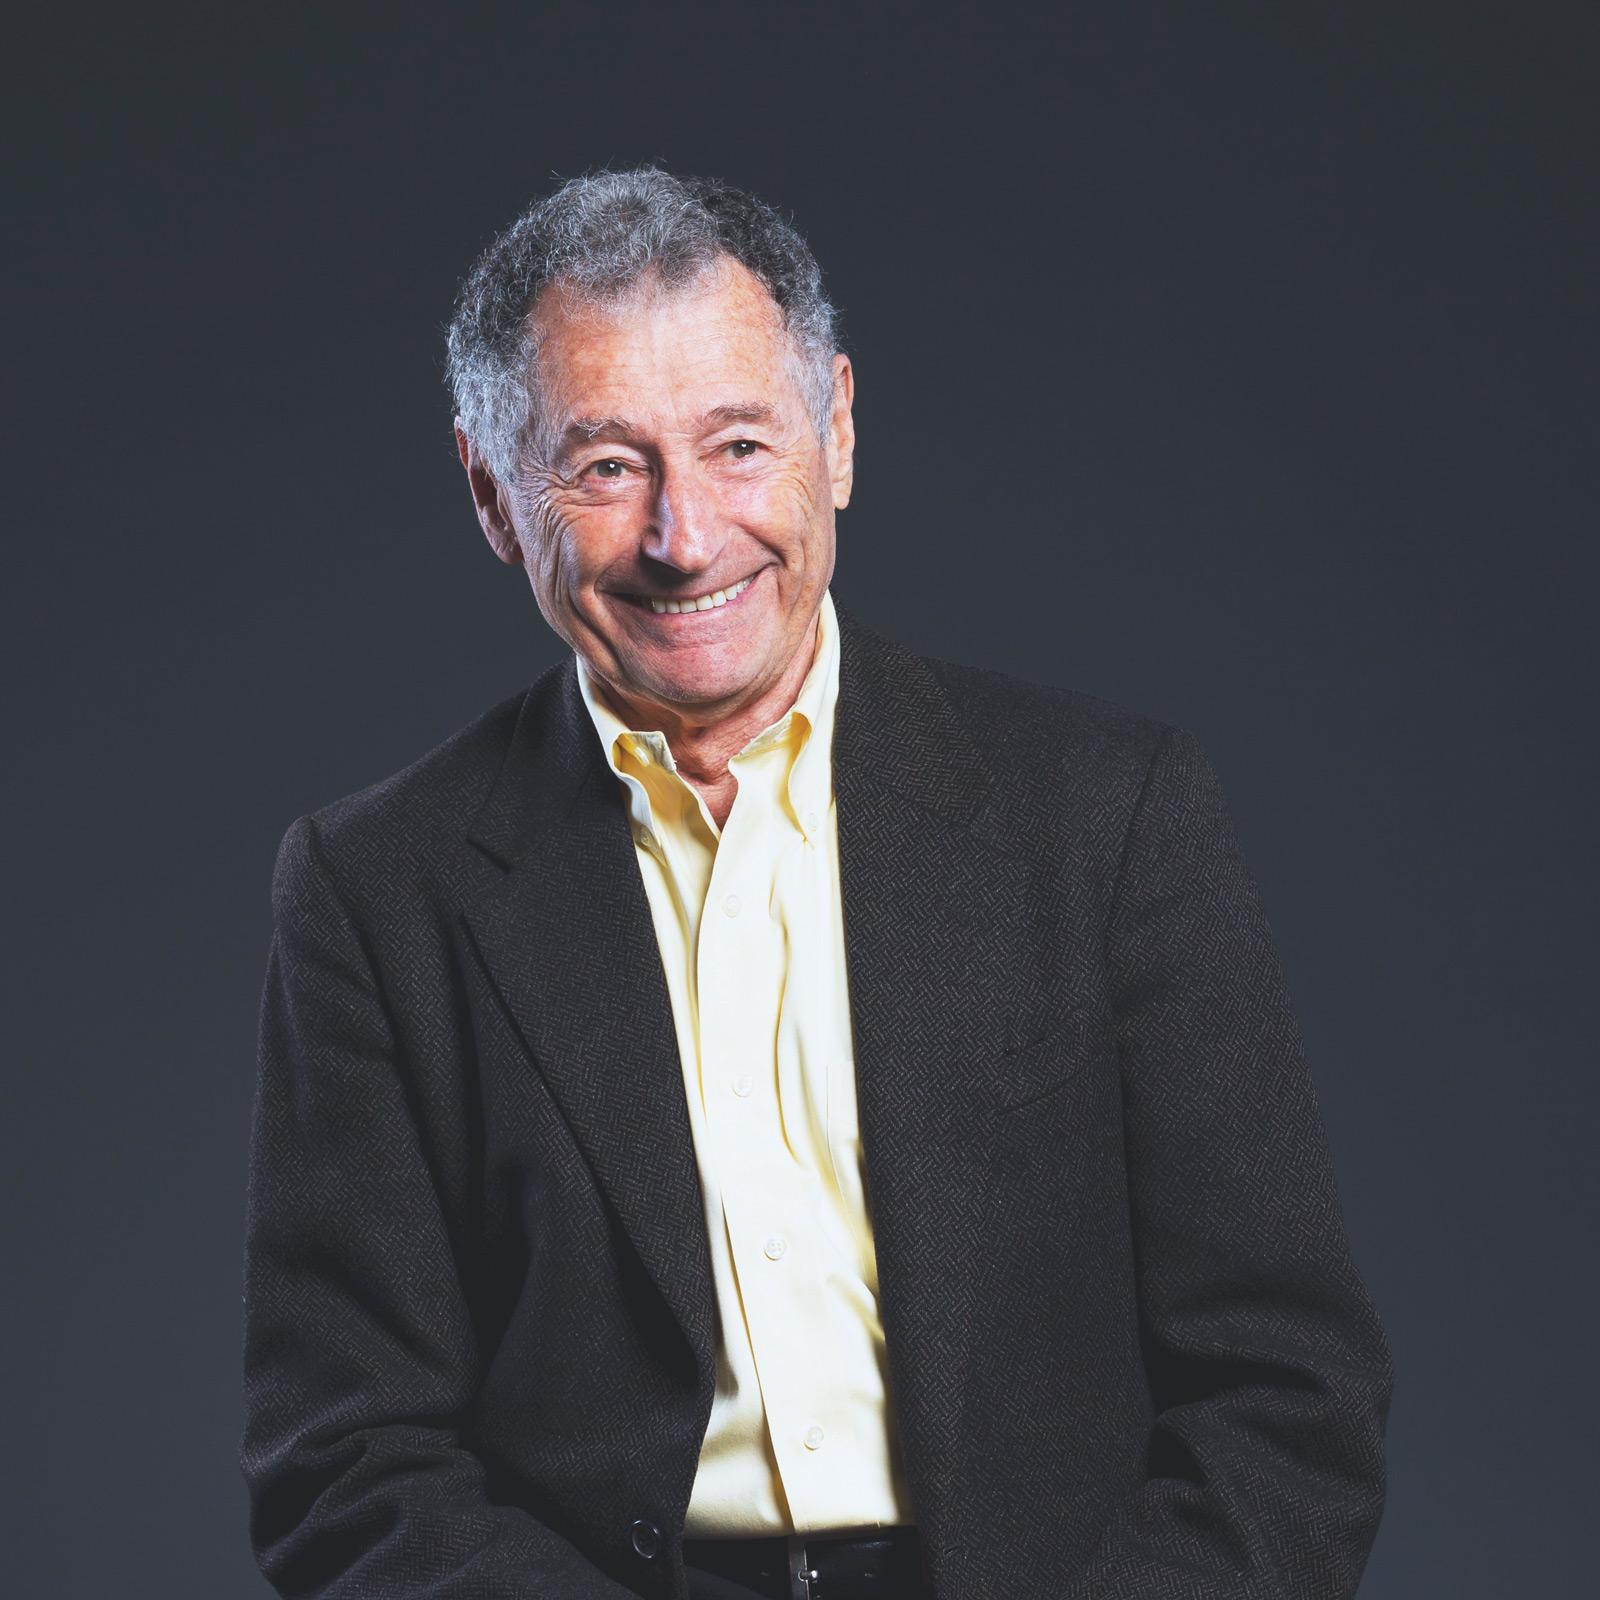 Professor Leonard Kleinrock